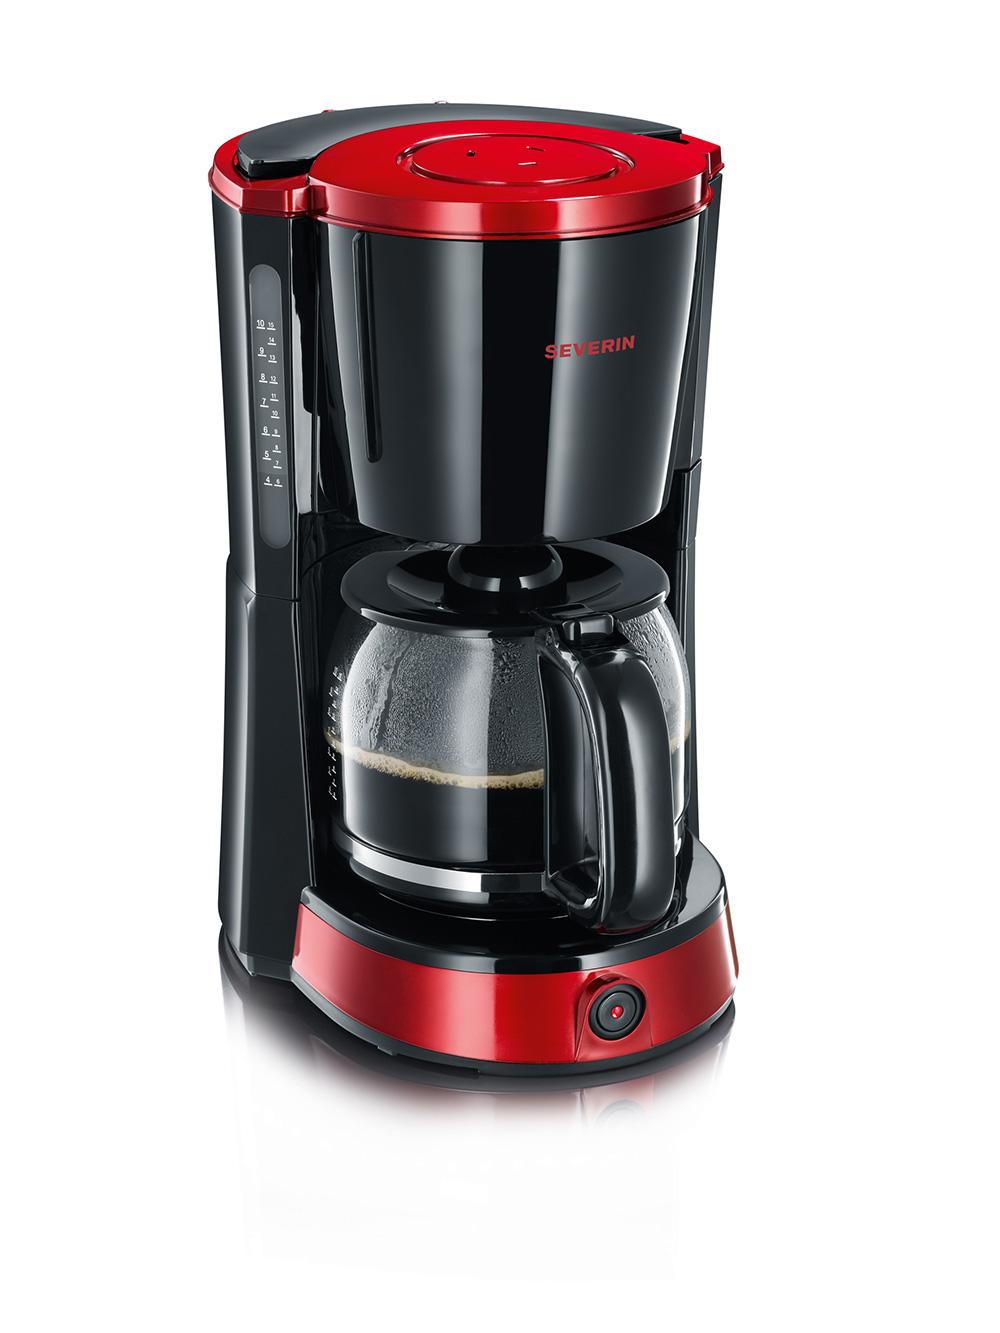 SEVERIN KA4492 Select Filtre Kahve Makinesi